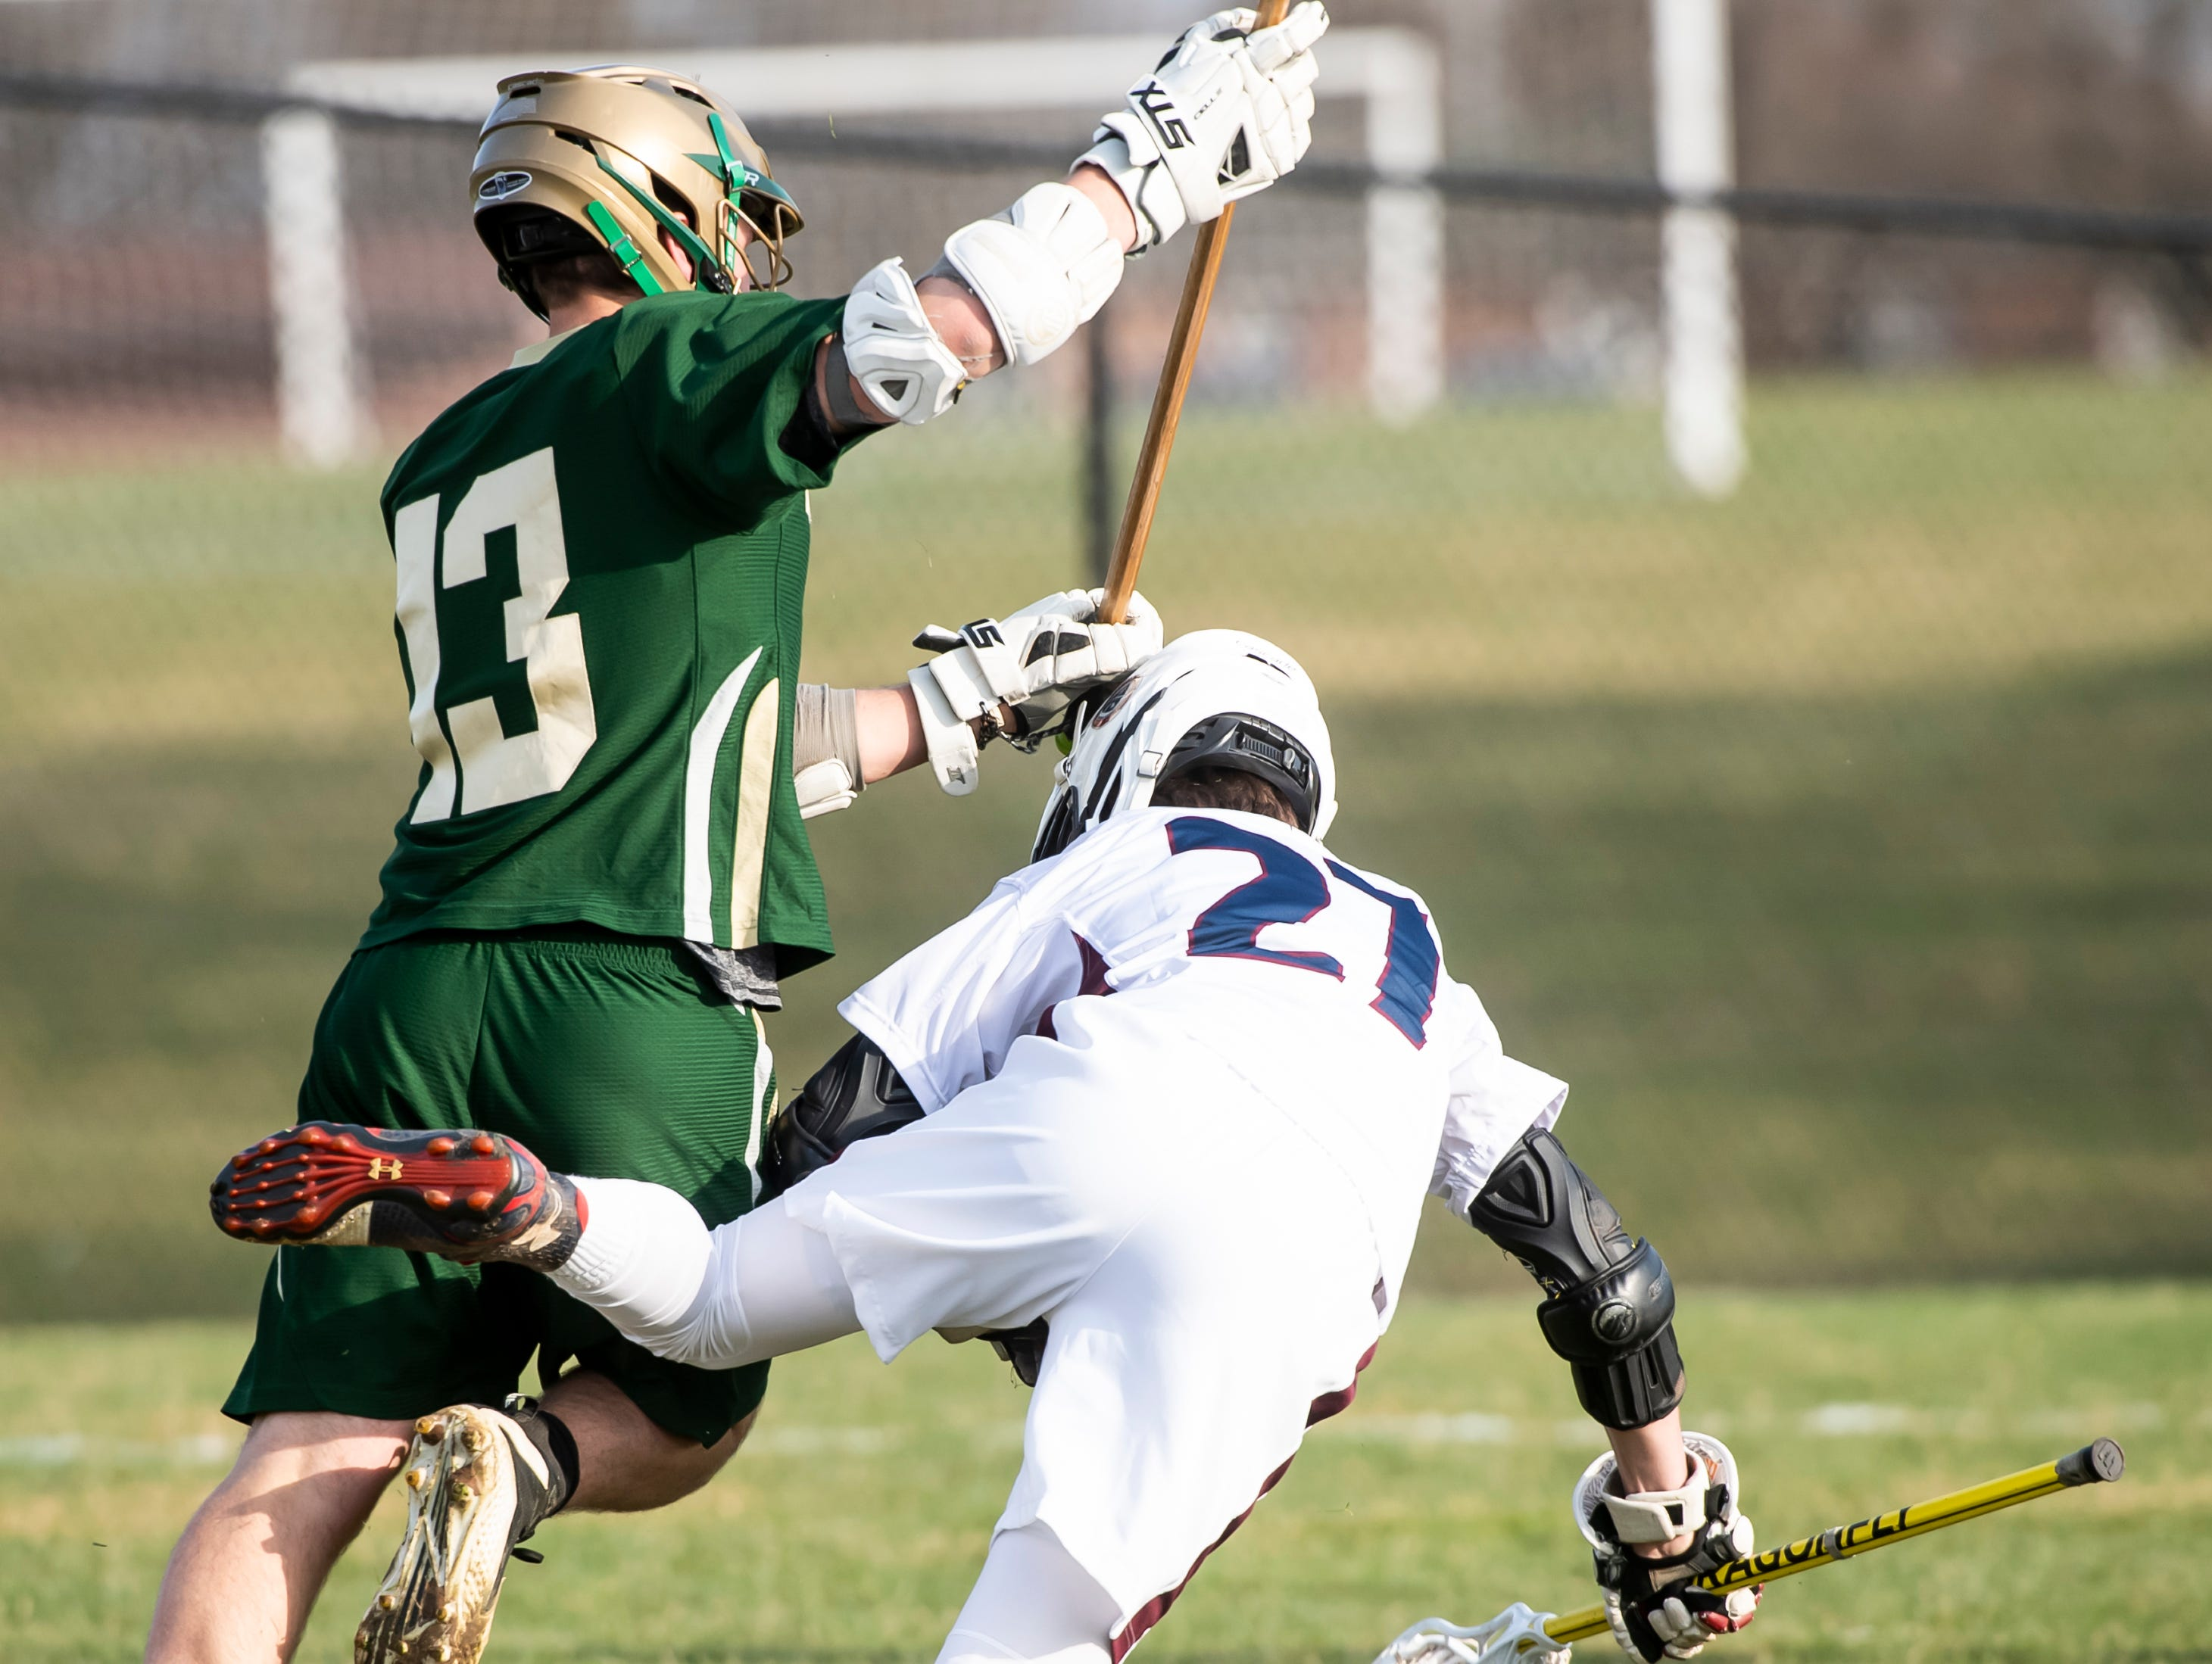 York Catholic's Ricky Pokrivka body checks New Oxford's Dylan Forbes during a YAIAA boys' lacrosse game on Thursday, April 4, 2019. York Catholic won 14-8.